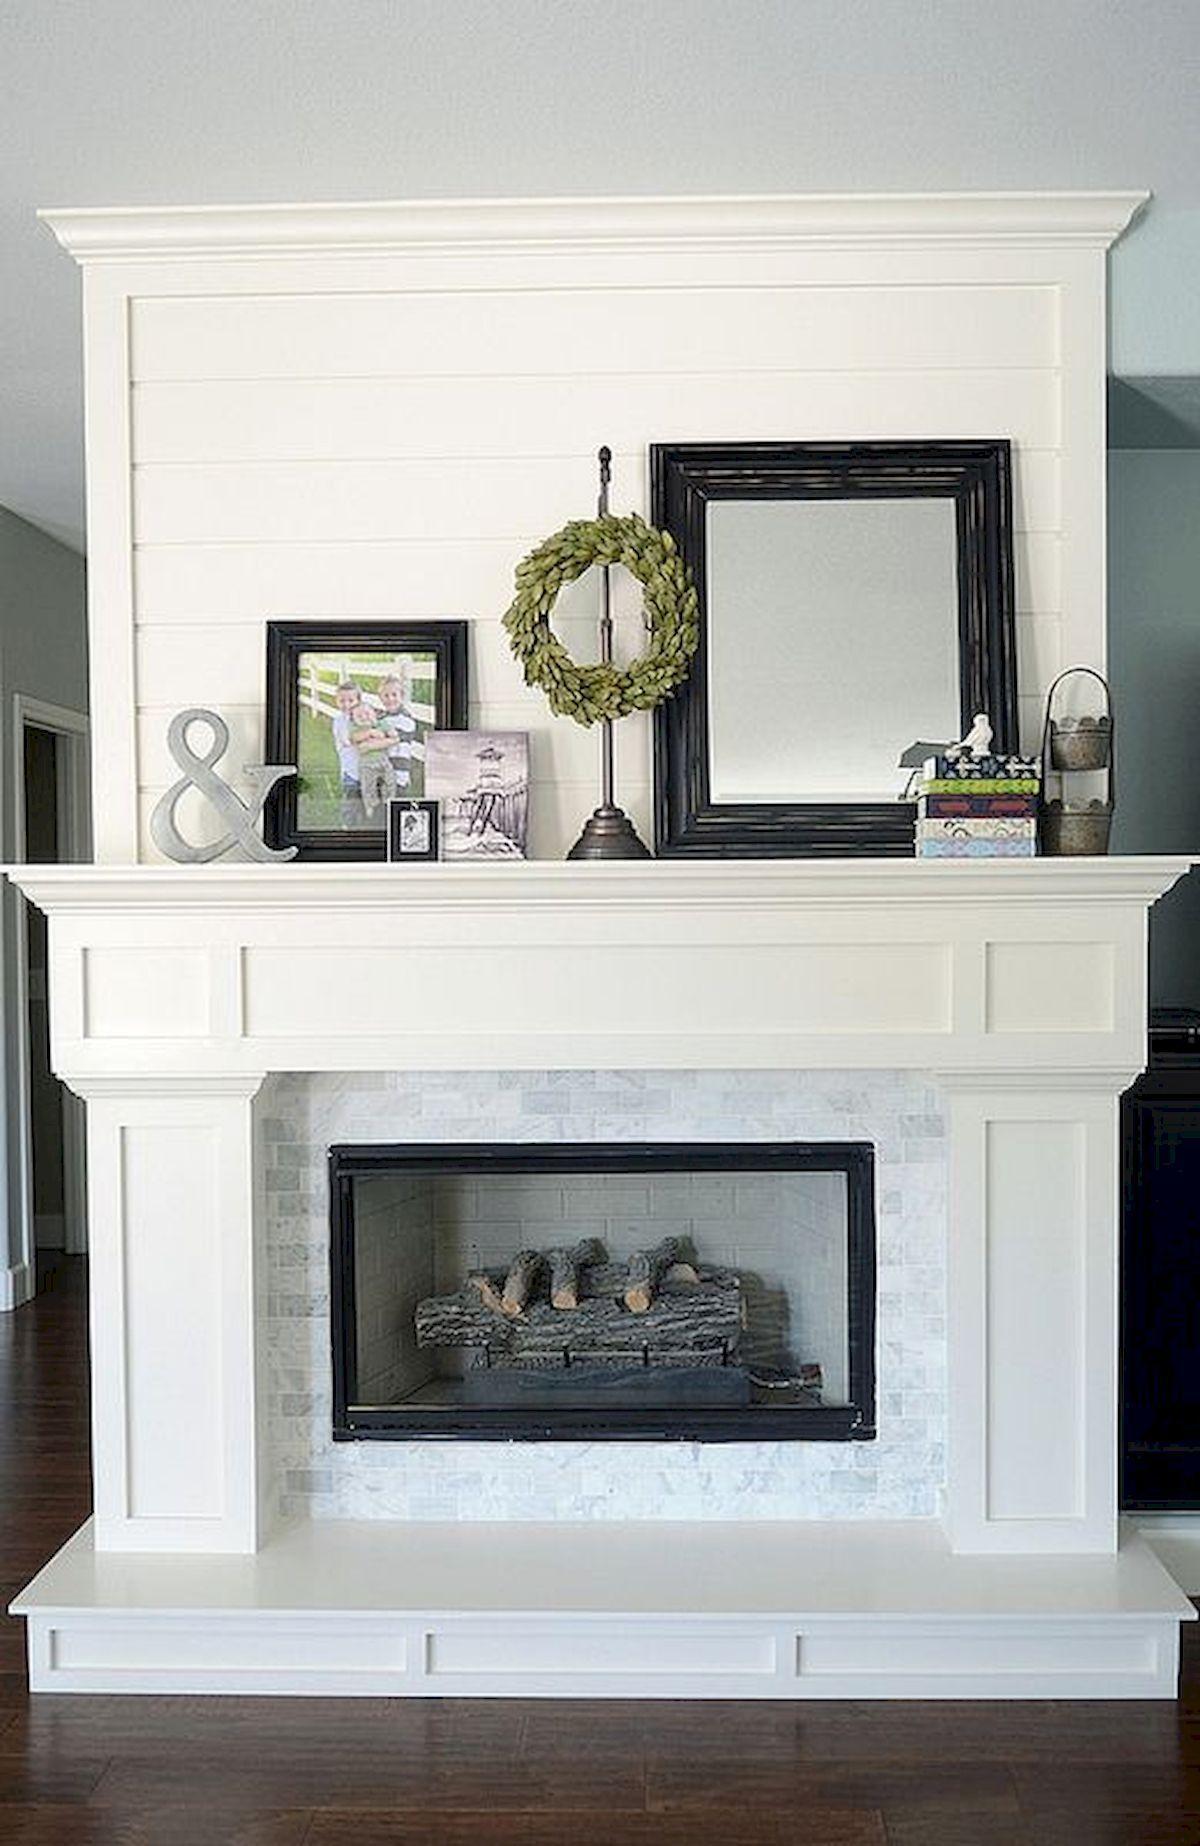 40 Best Modern Farmhouse Fireplace Mantel Decor Ideas 6 Home Fireplace Home Living Room Fireplace Mantel Decor